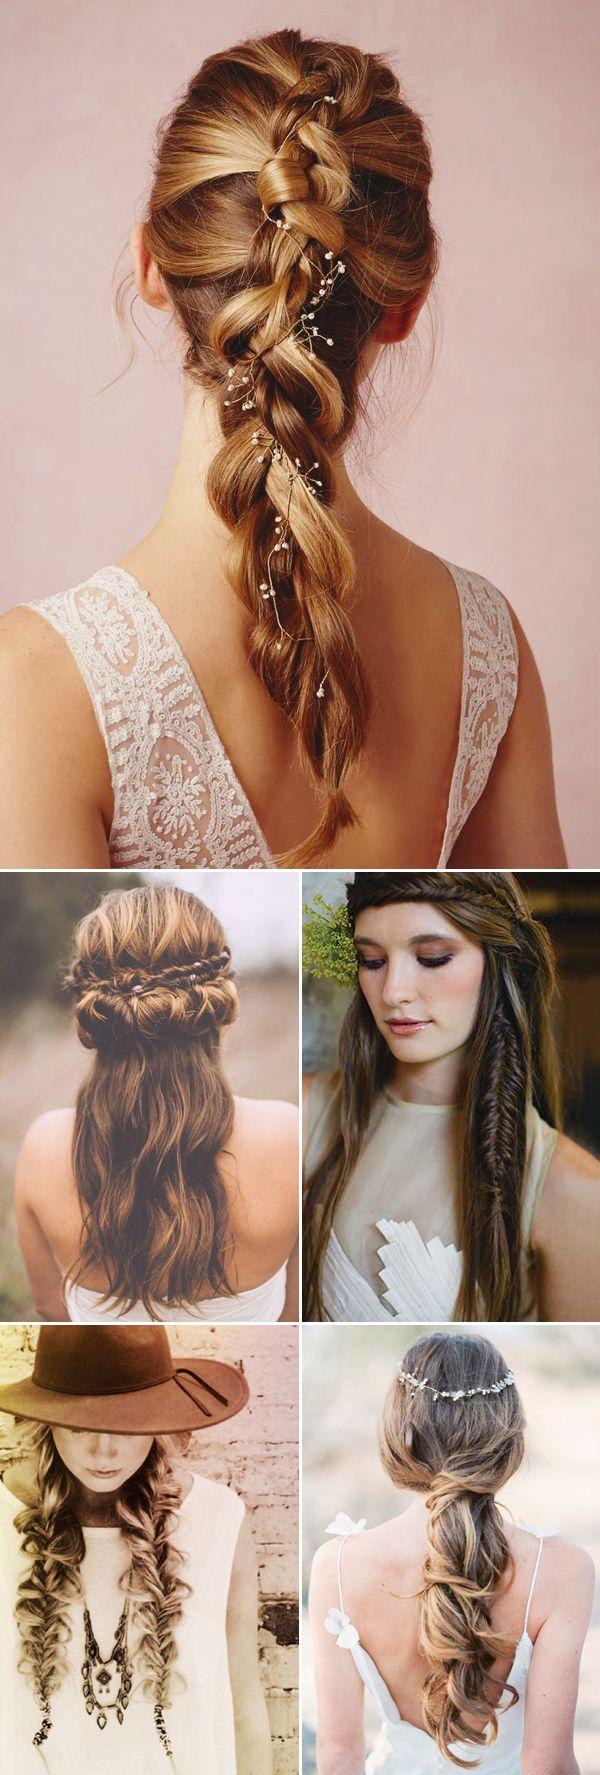 Oh so romantic natural bohemian braided hairstyles boho